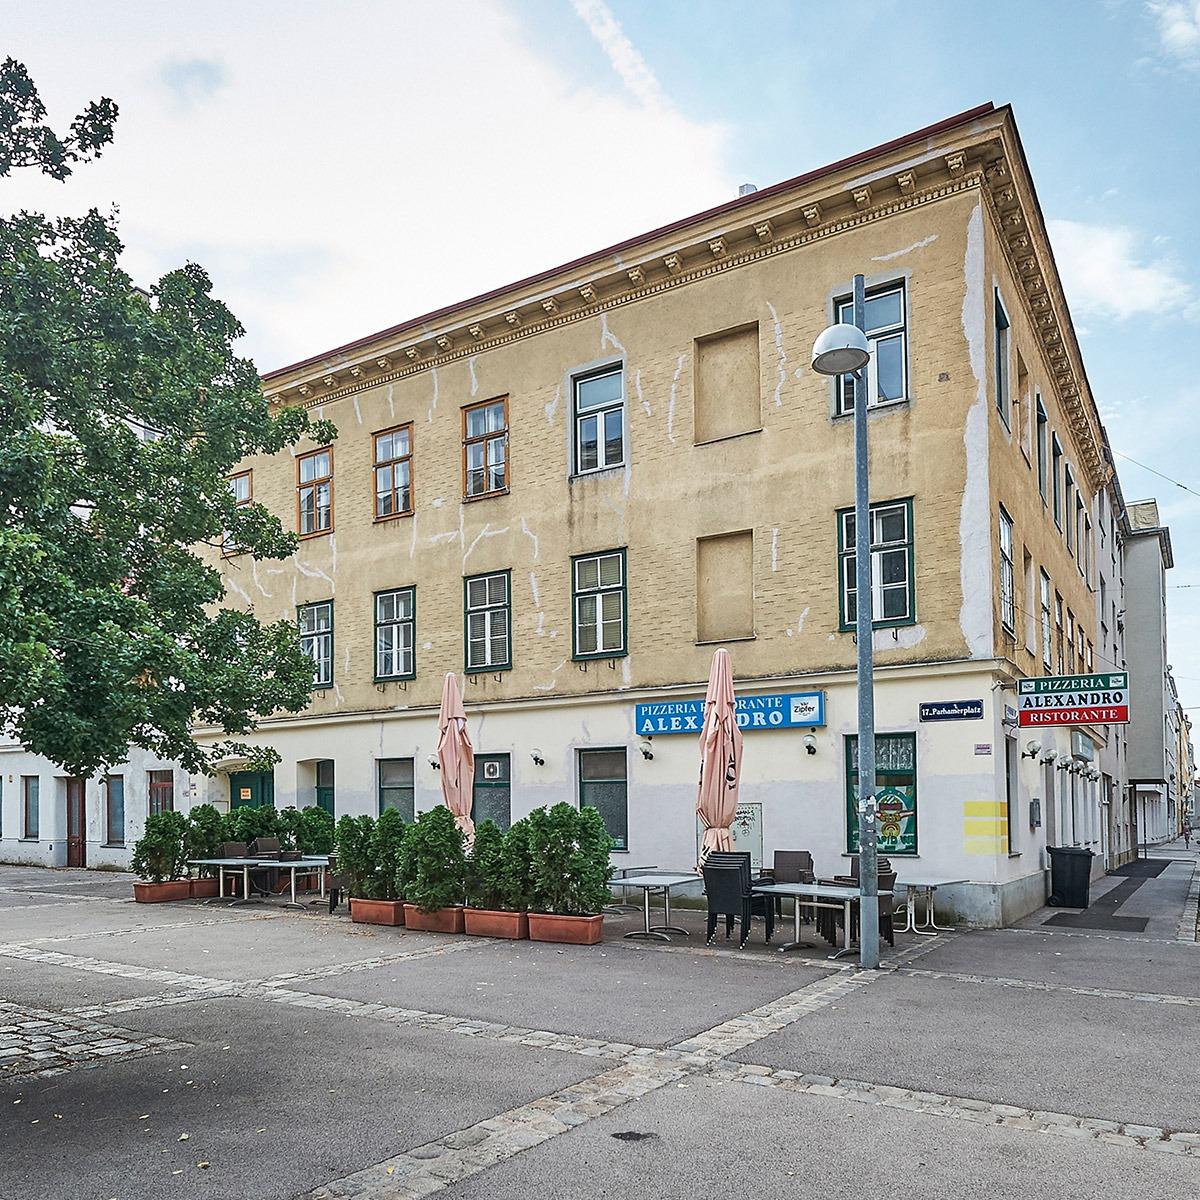 2018 1170 Parhamerplatz